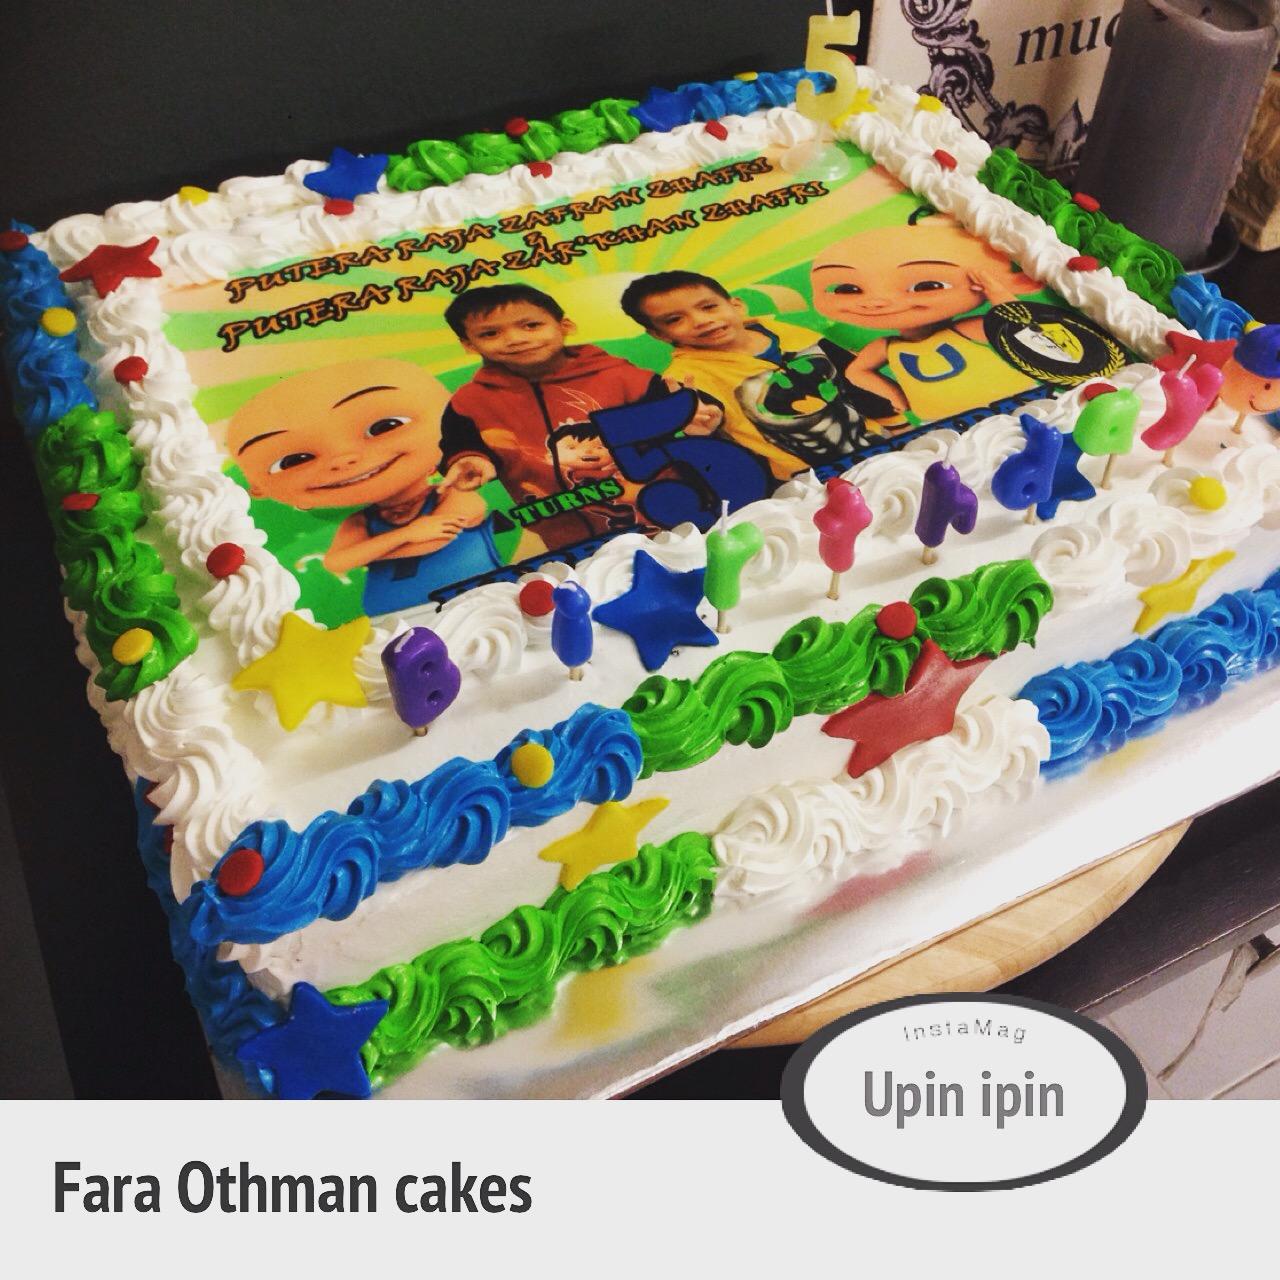 ~Cupcakes At Putrajaya~: UPIN IPIN BIRTHDAY CAKE